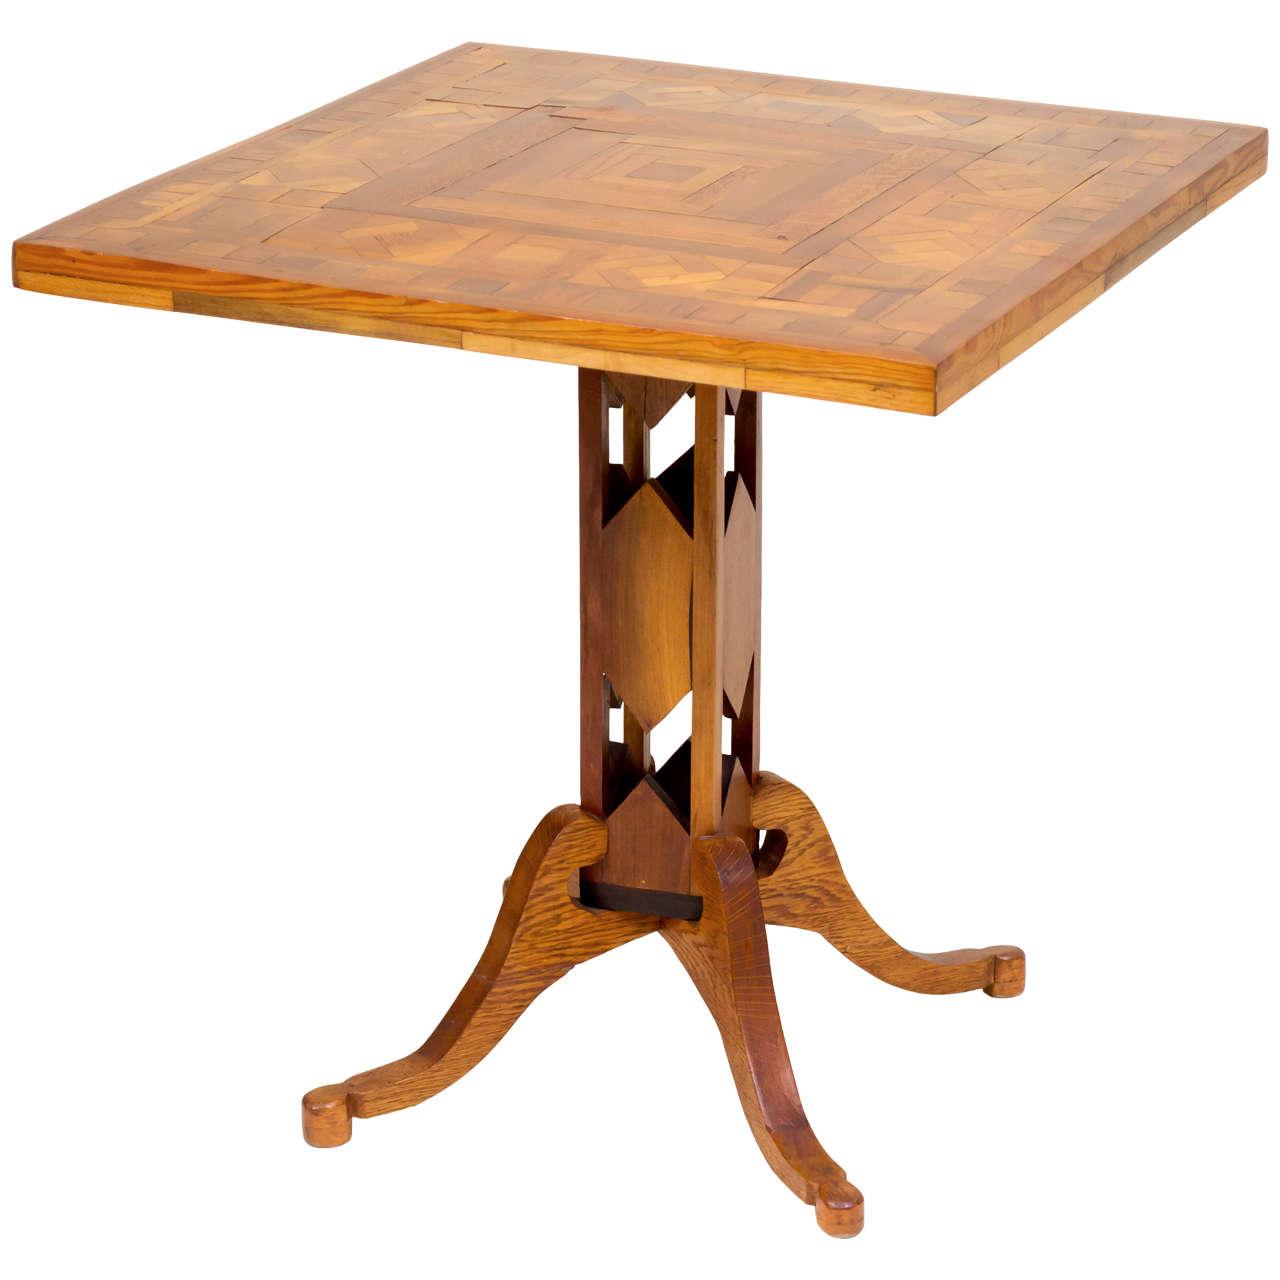 Early 20th Century American Folk Art Pedestal Table